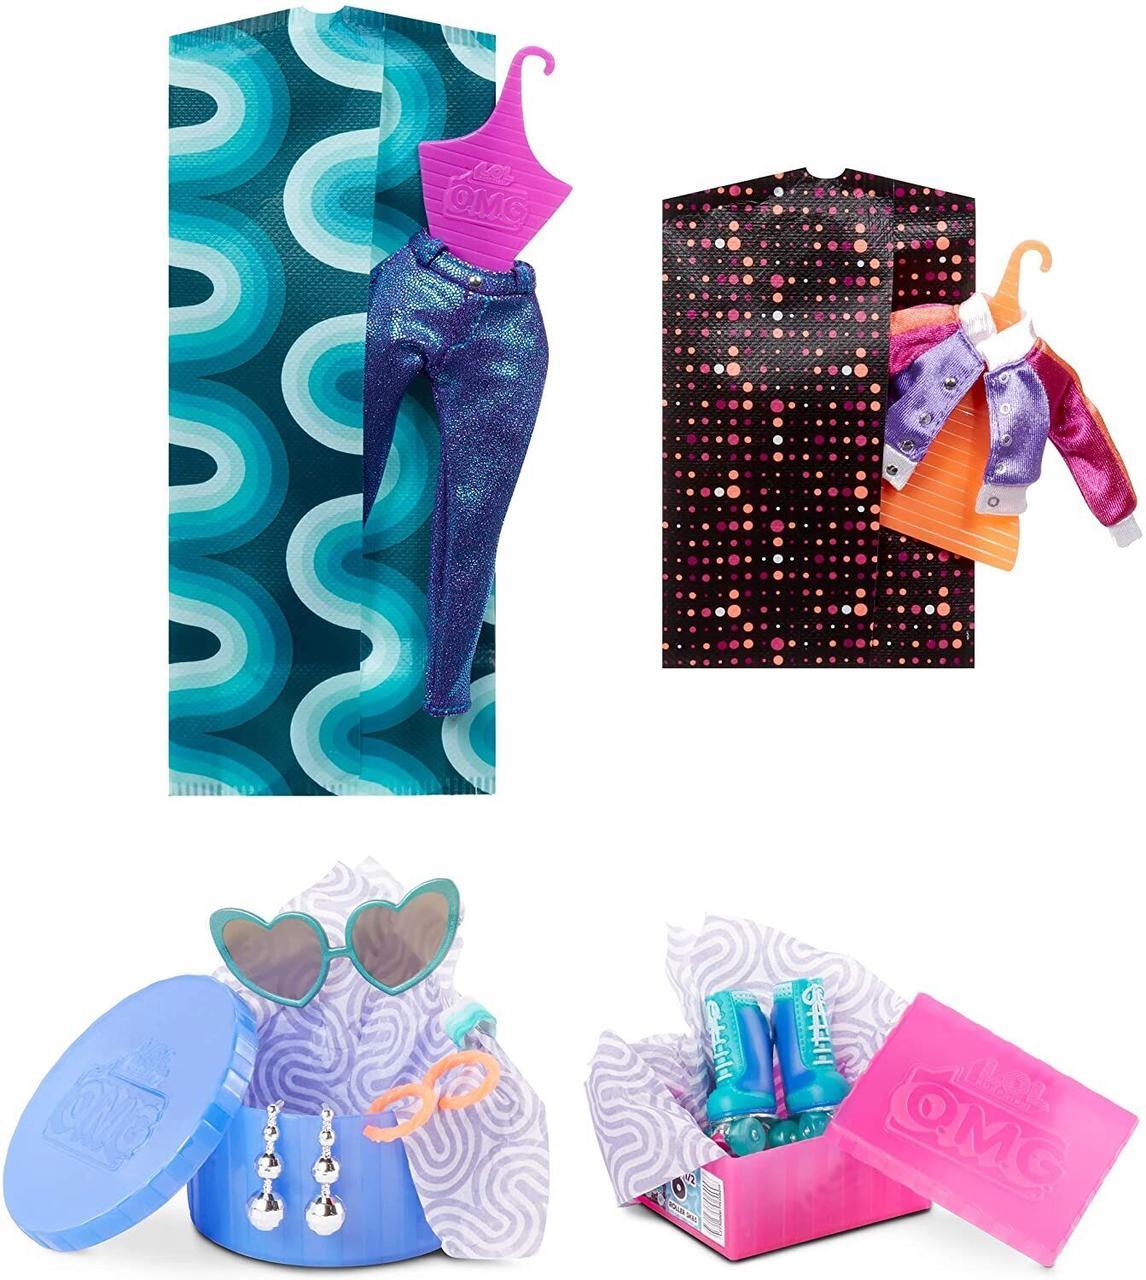 LOL OMG Модная Кукла Диско-Скейтер (Roller Chick), 3 серия, ЛОЛ ОМГ Сюрприз - фото 6